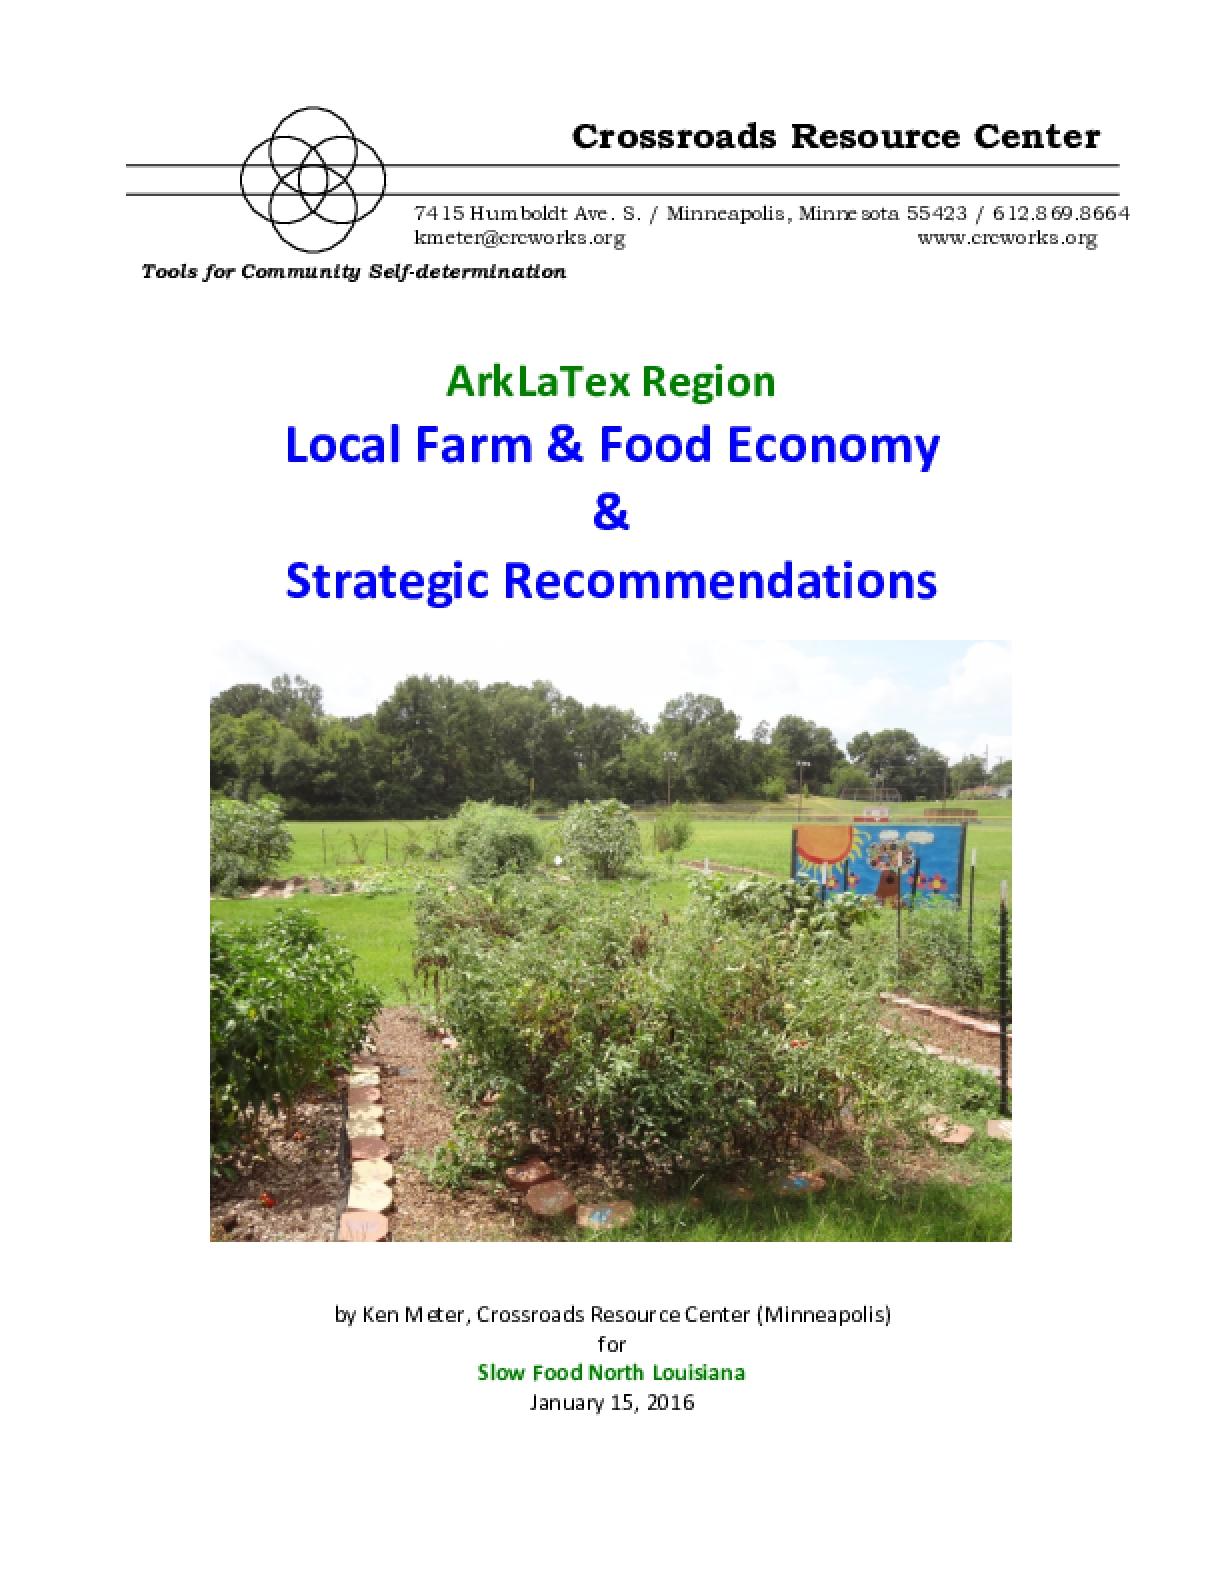 ArkLaTex Region Local Farm & Food Economy & Strategic Recommendations